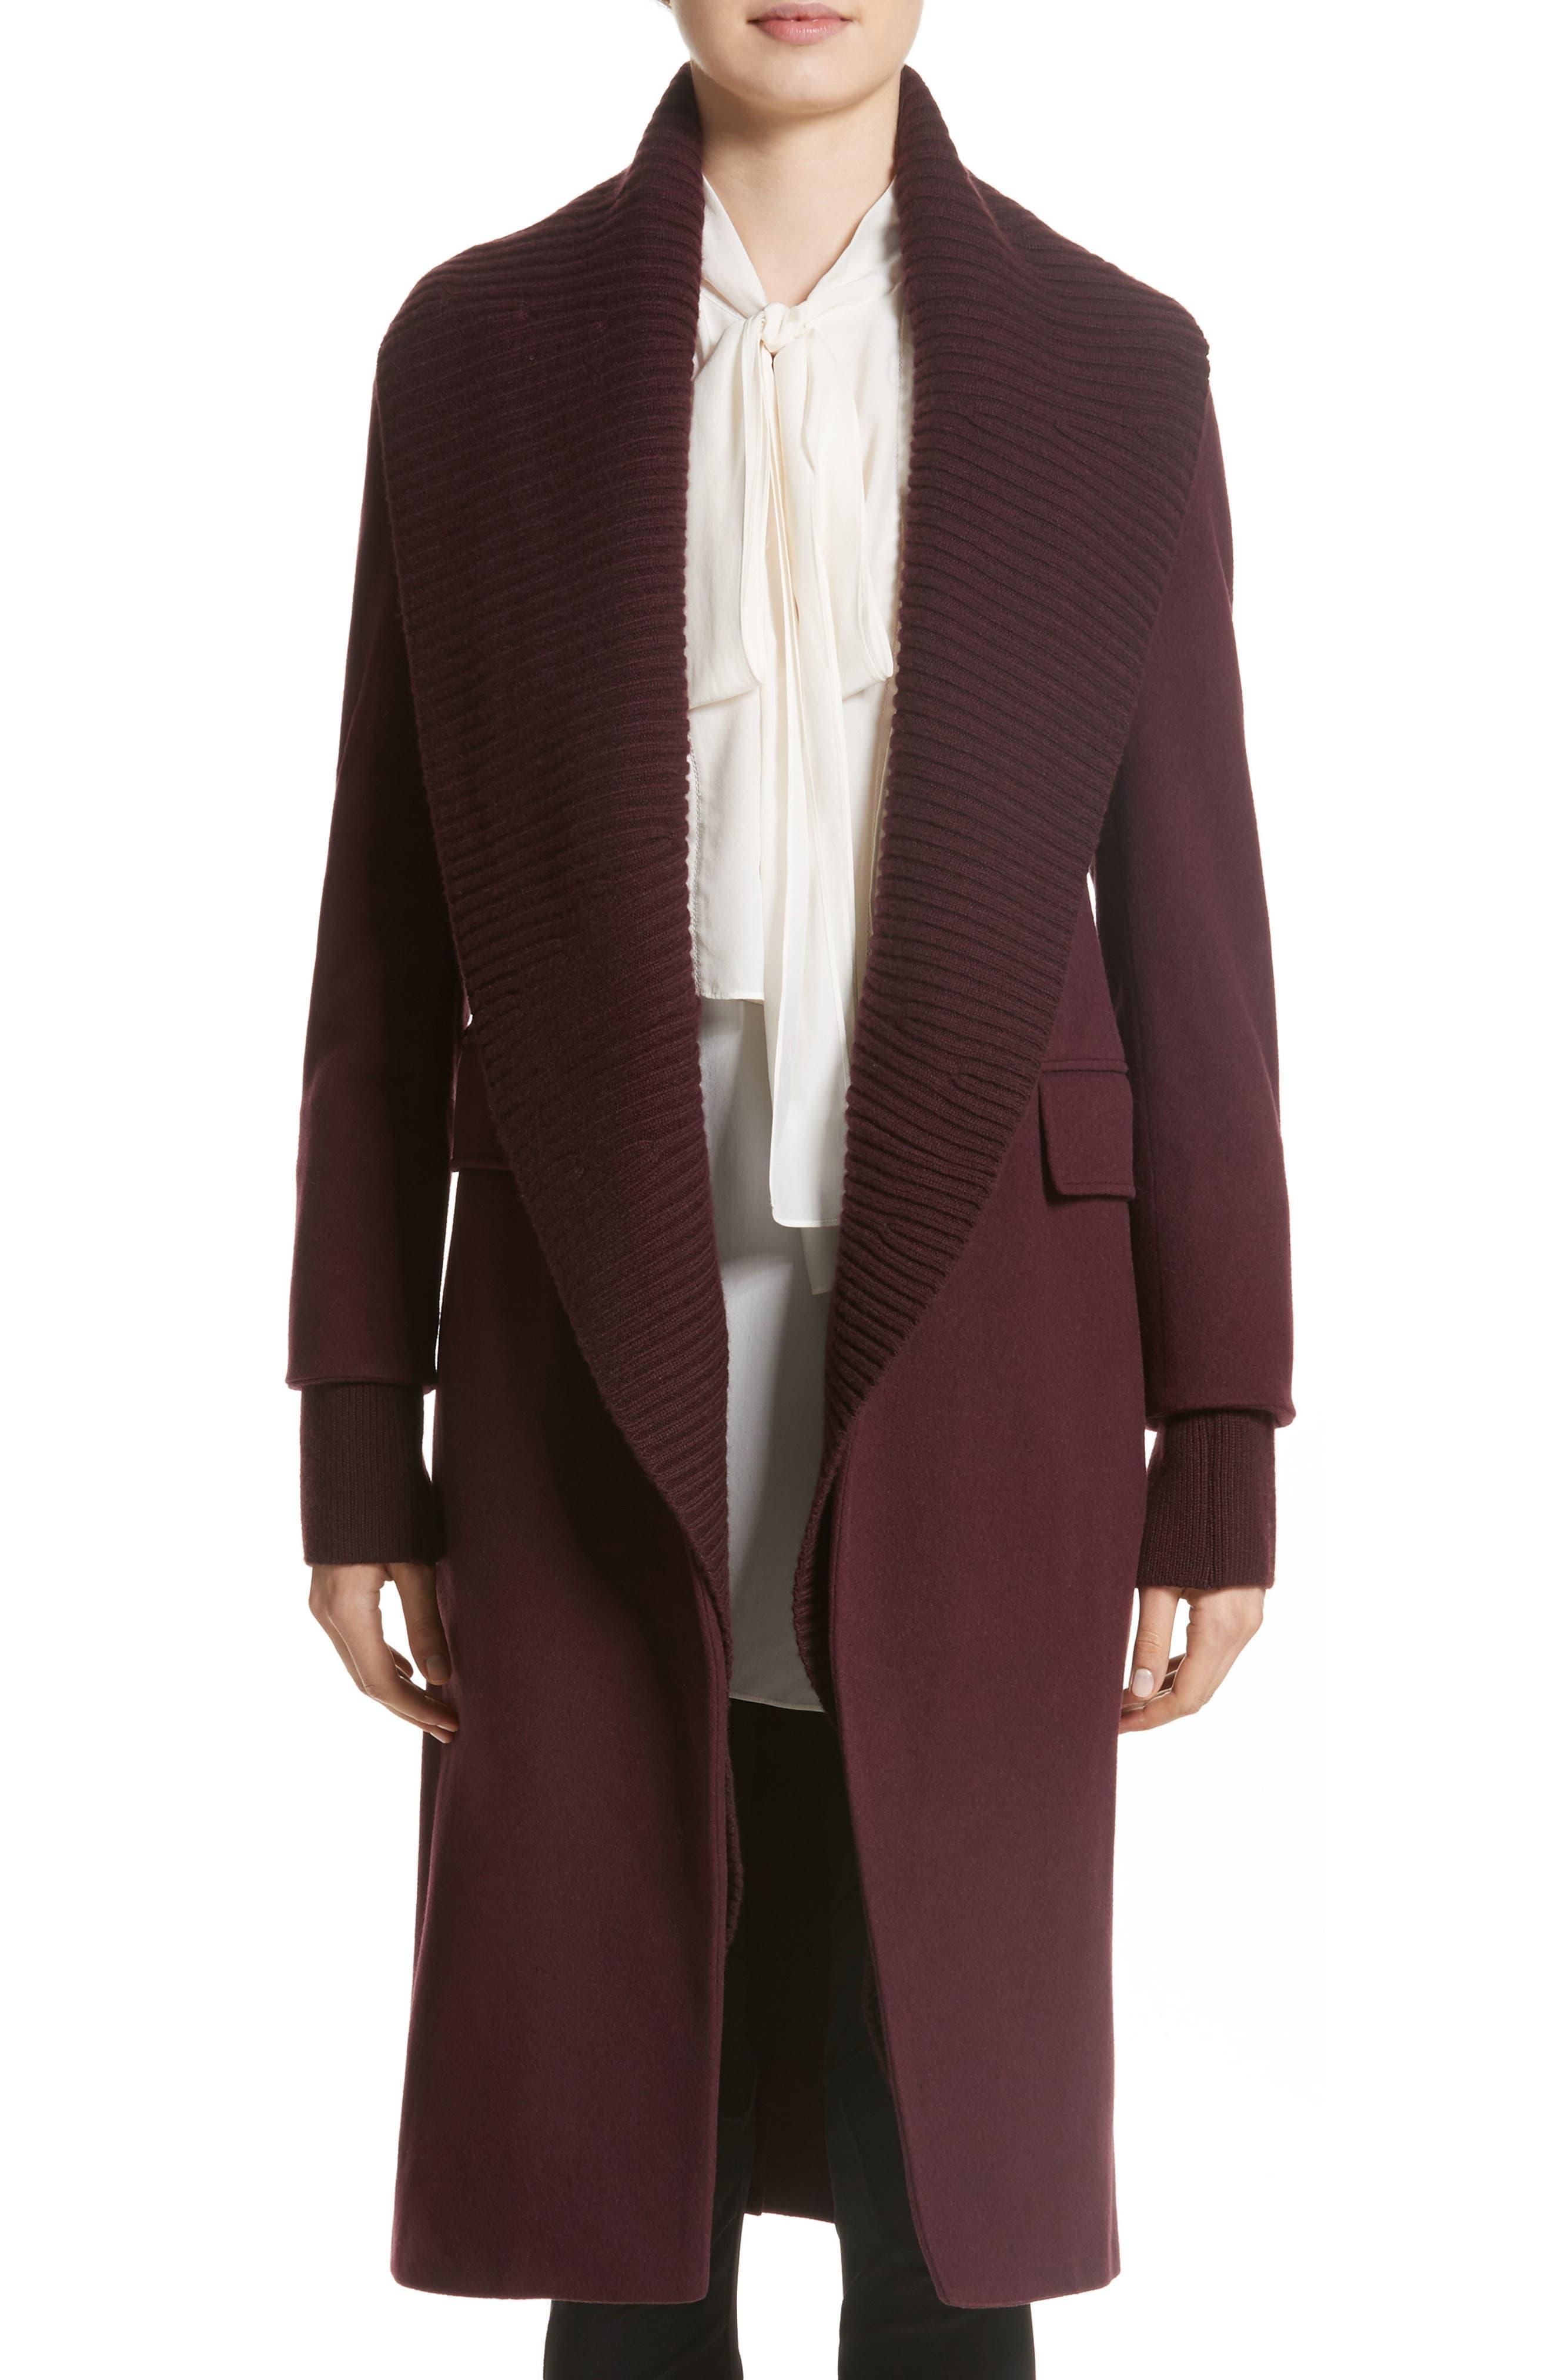 Main Image - Burberry Cairndale Knit Trim Cashmere Coat